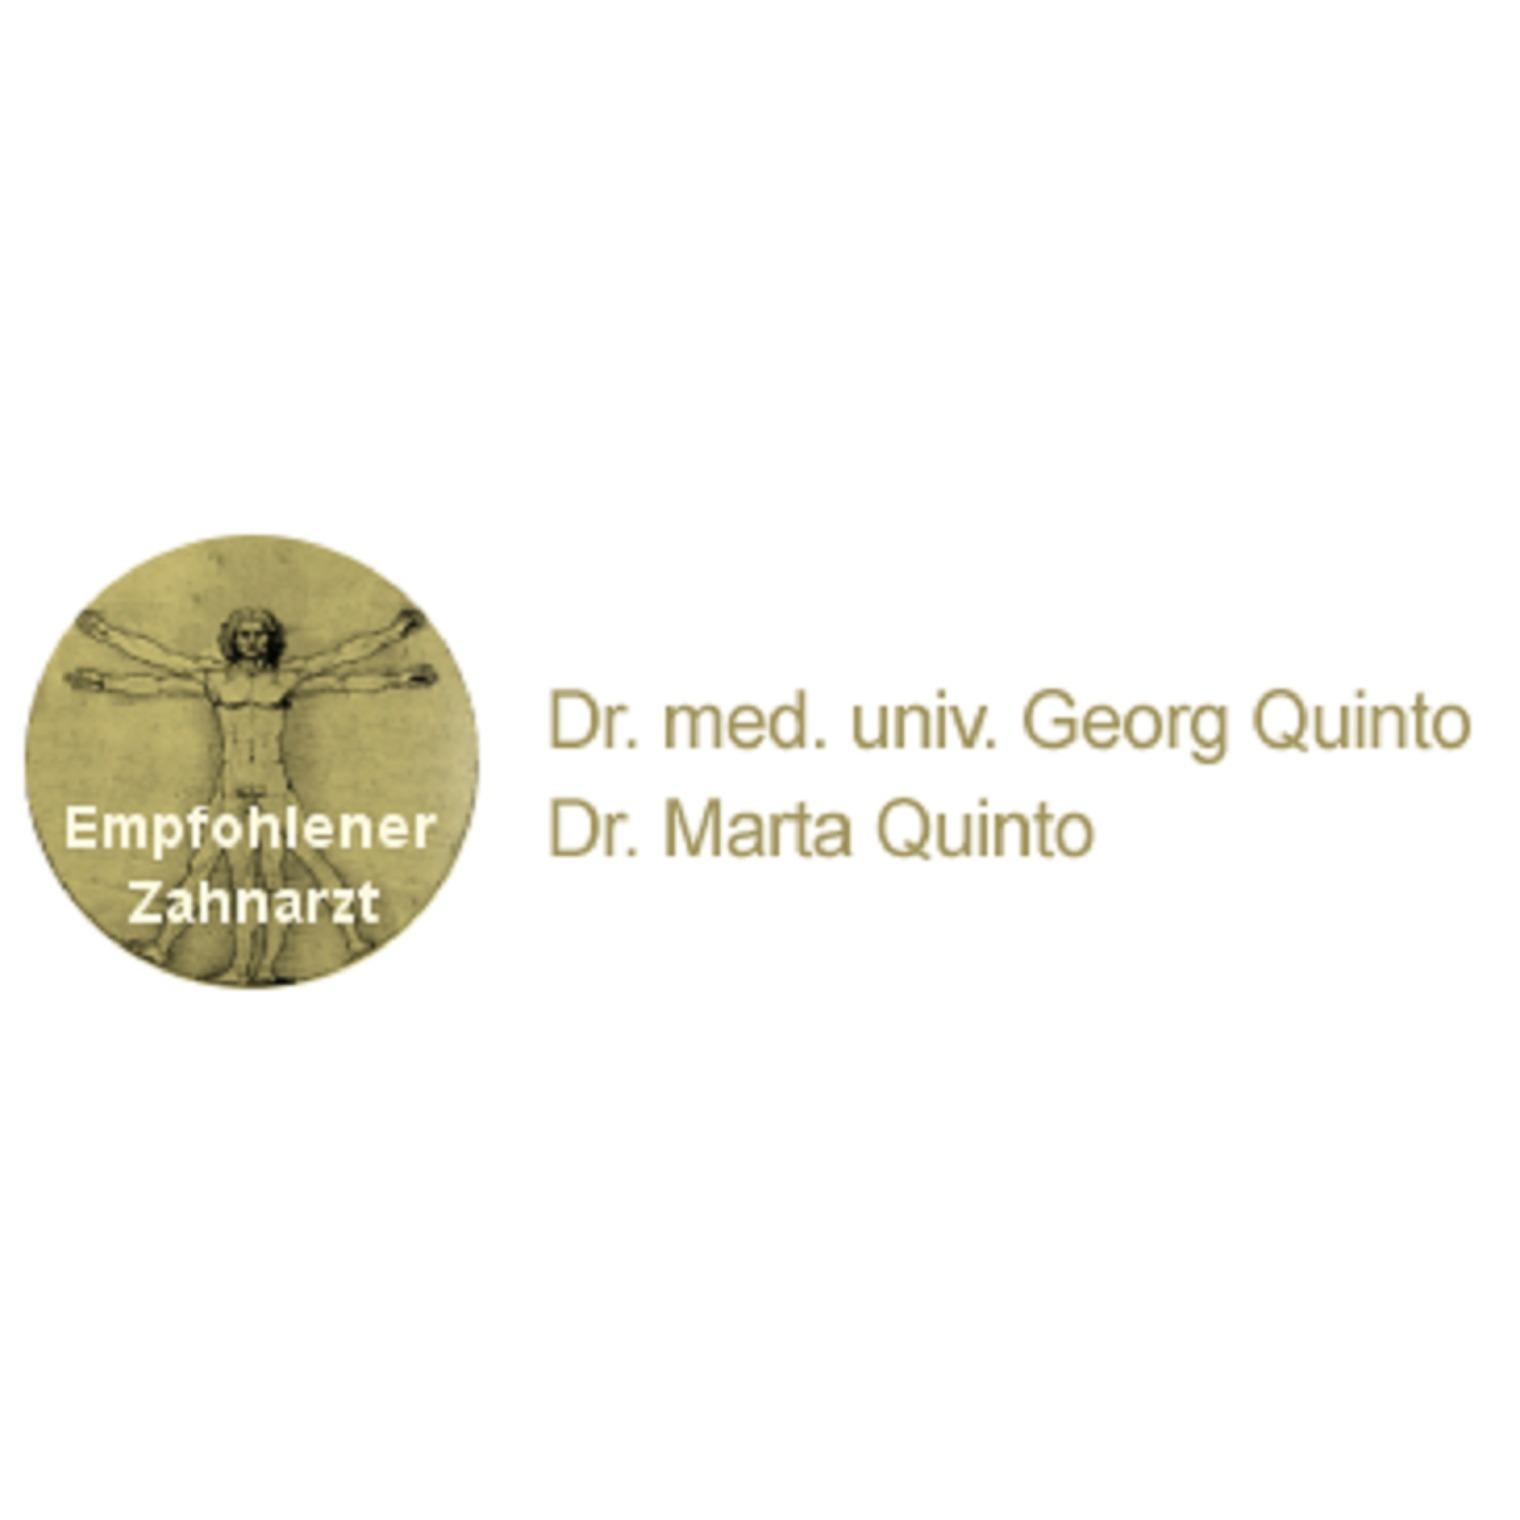 Dr. Georg Quinto & Dr. Marta Quinto